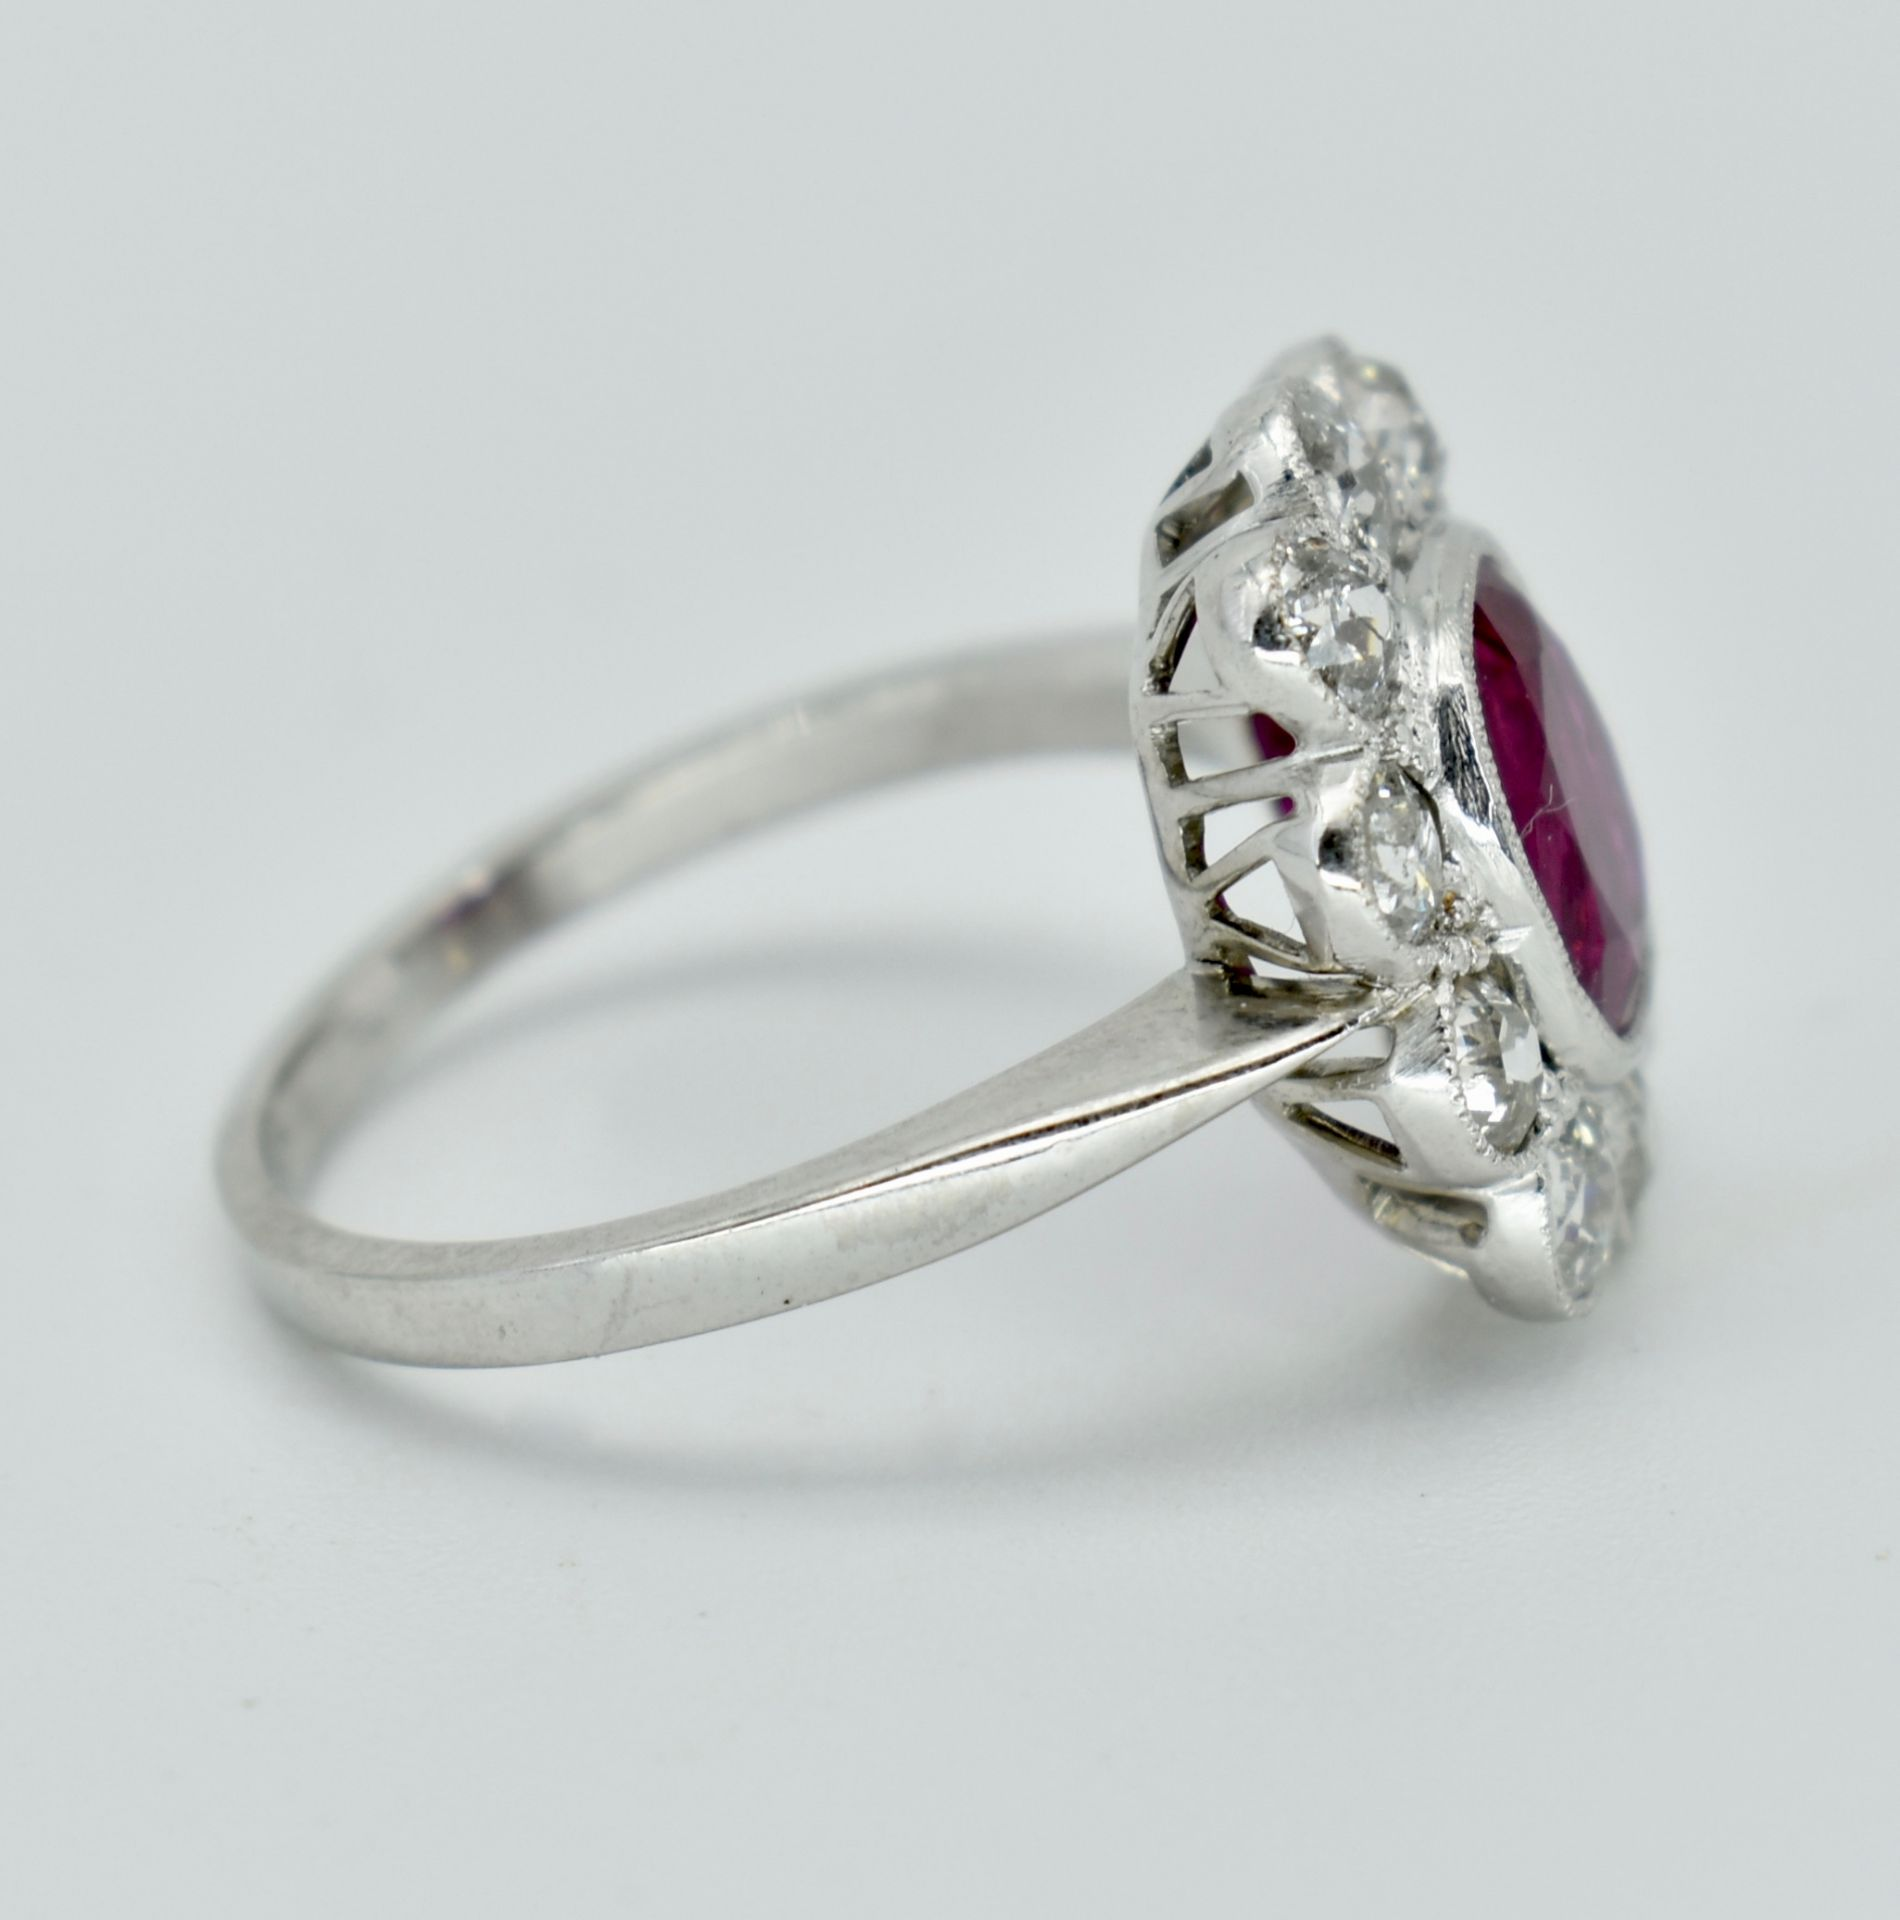 950 Platinum Burma Ruby & Diamond Cluster Ring - Image 2 of 5